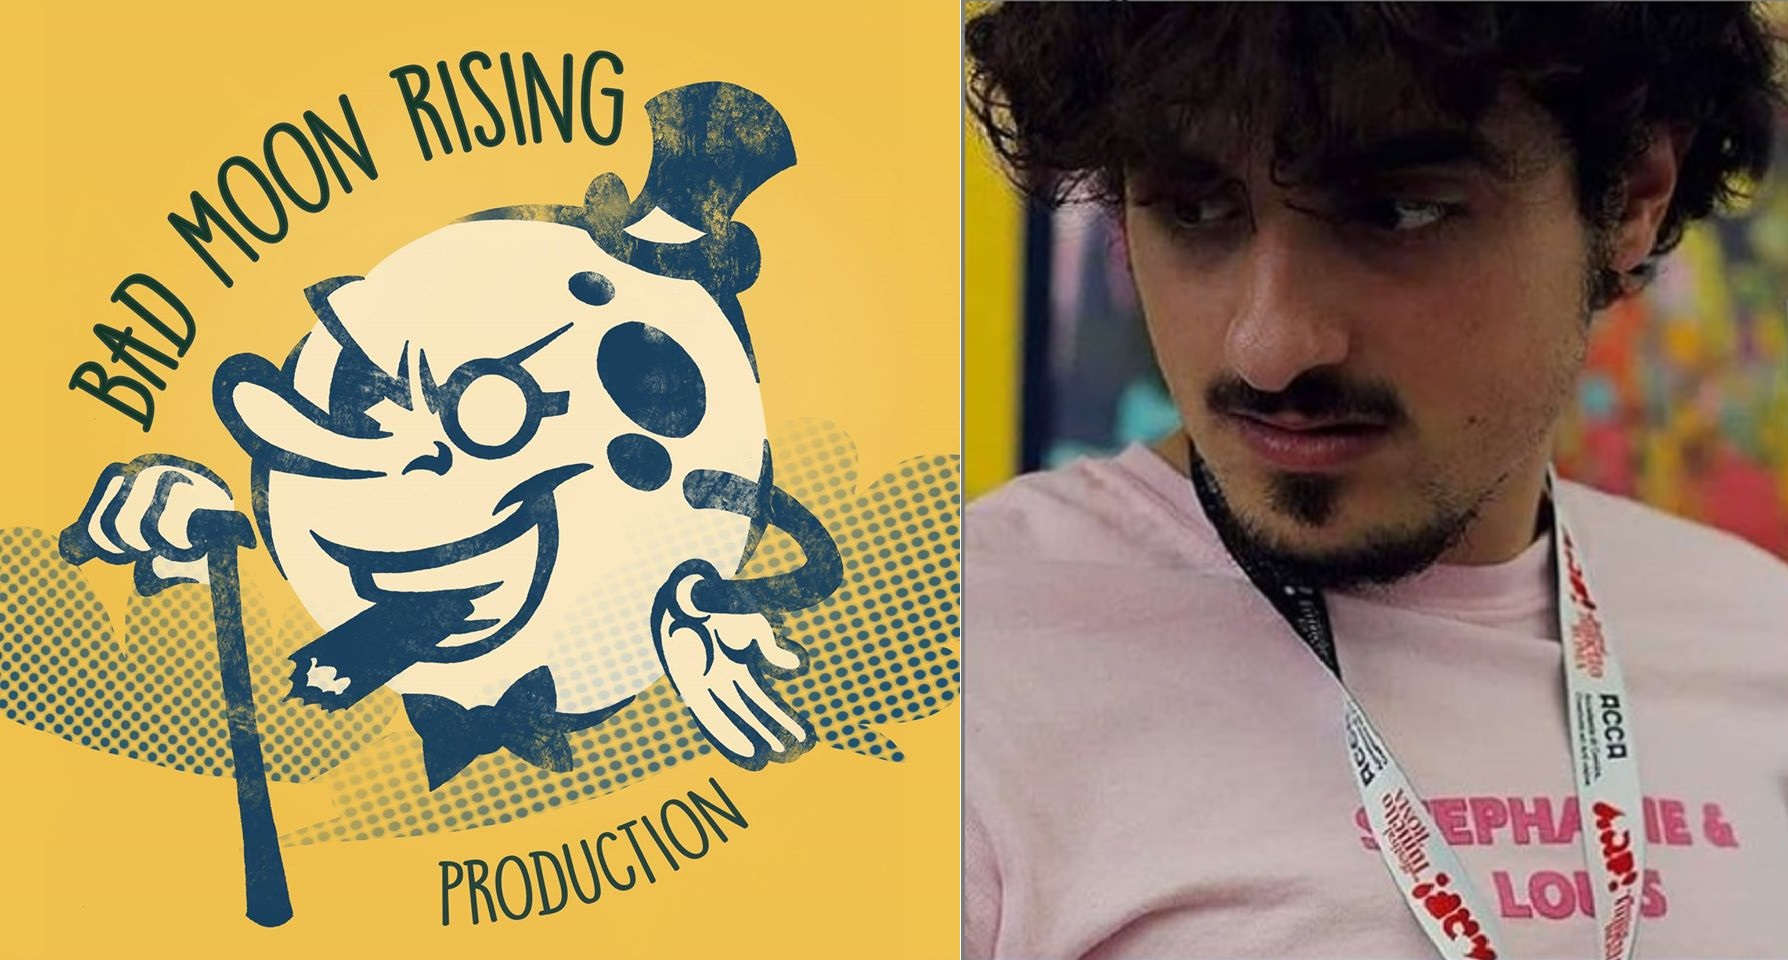 Bad Moon Rising Production: Intervista a Lorenzo La Neve 1